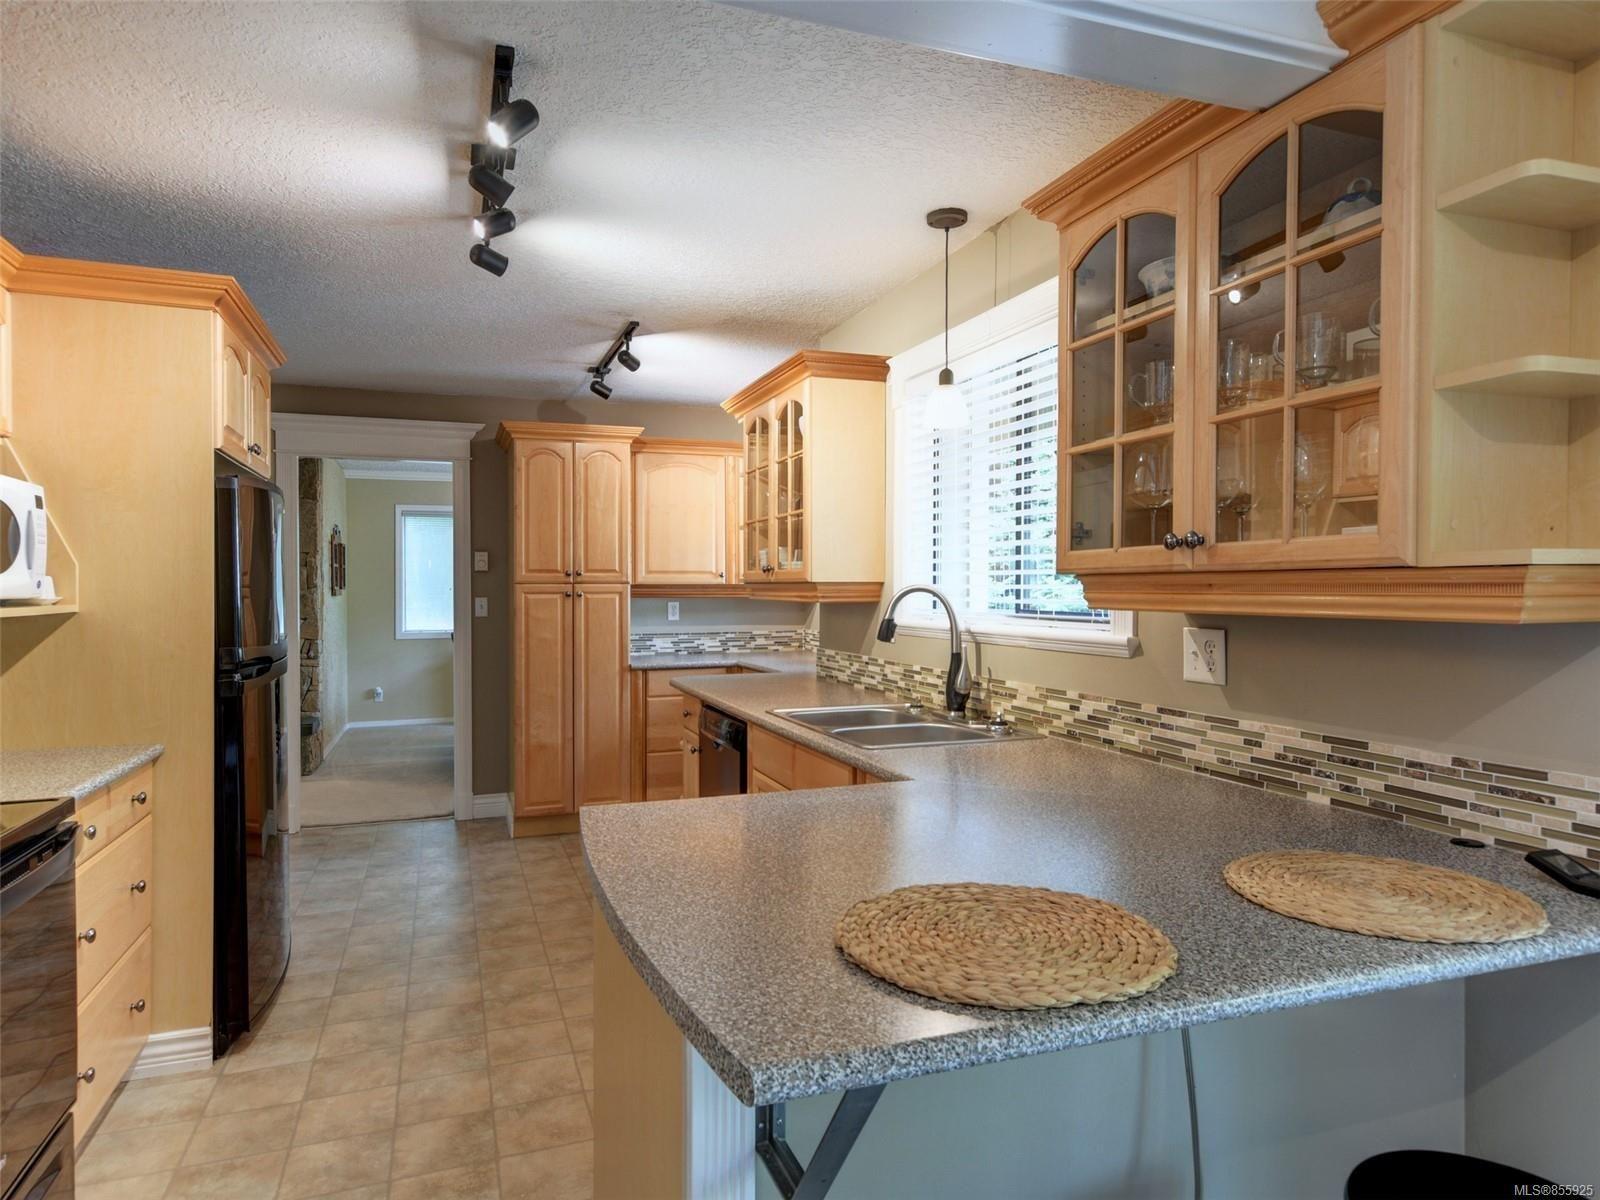 Main Photo: 4406 Hilton Pl in : SE Gordon Head House for sale (Saanich East)  : MLS®# 855925